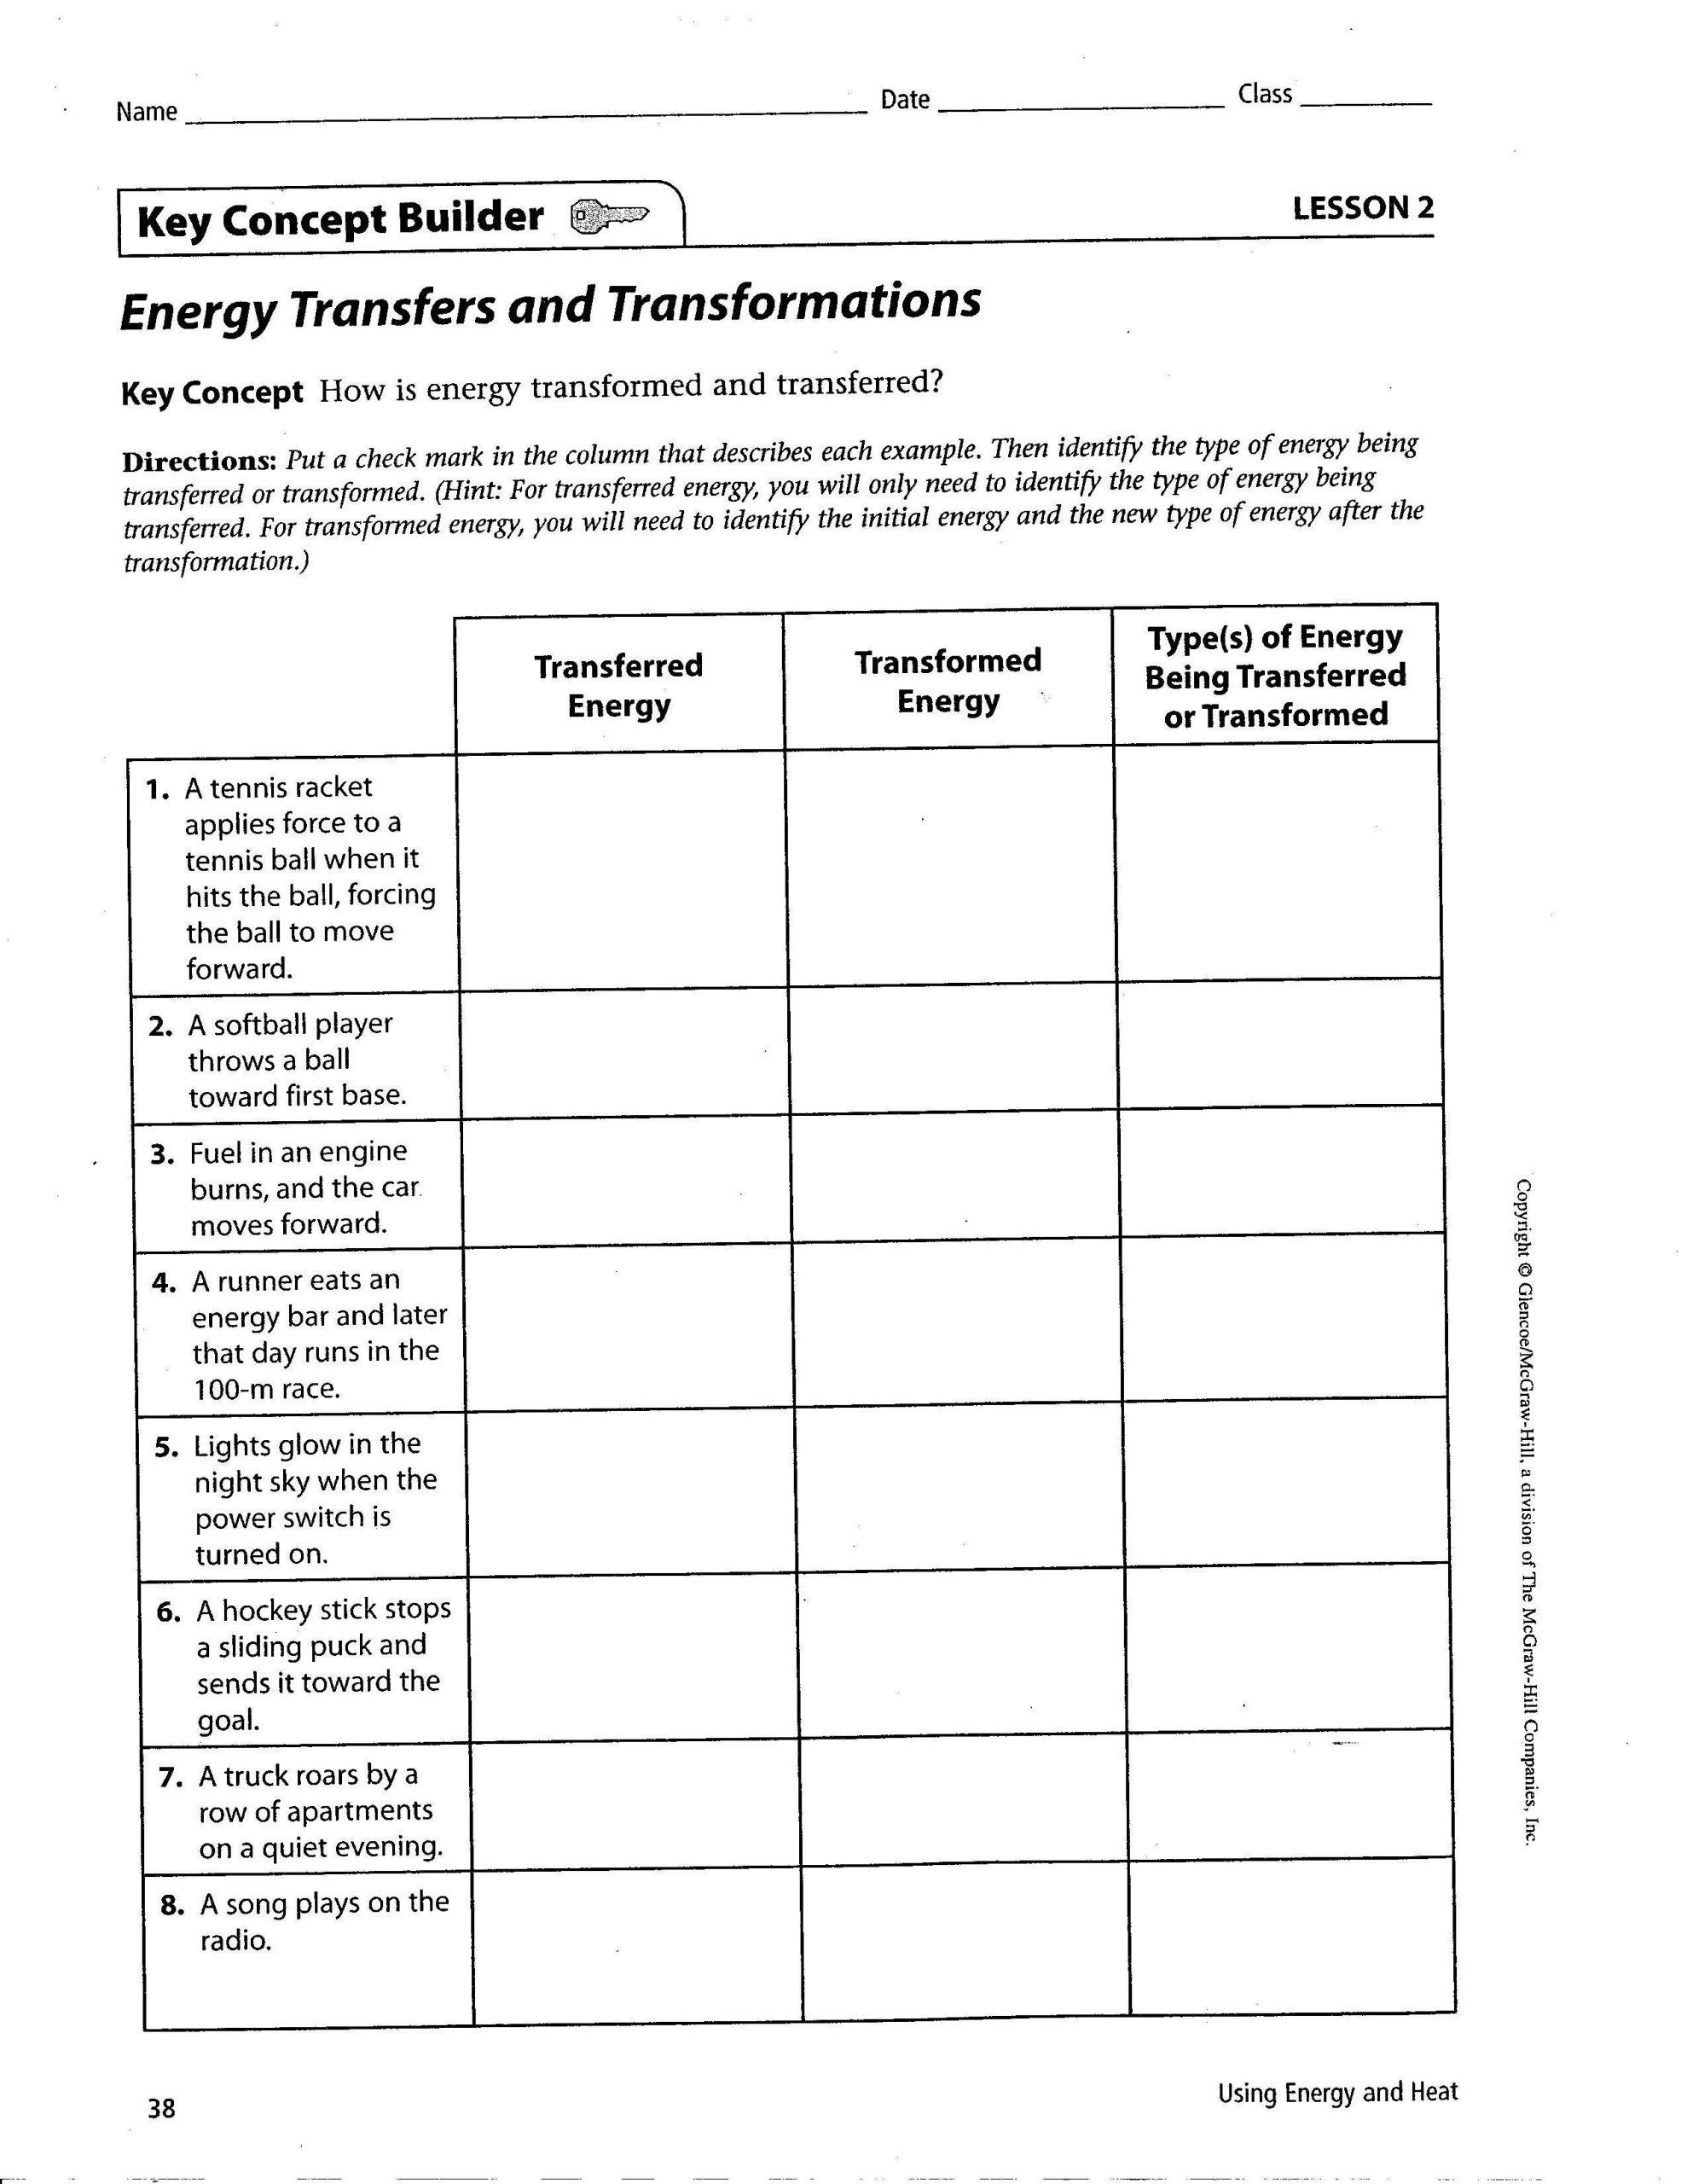 Energy Transformation Worksheet Answer Key Energy Transformation Game Worksheet